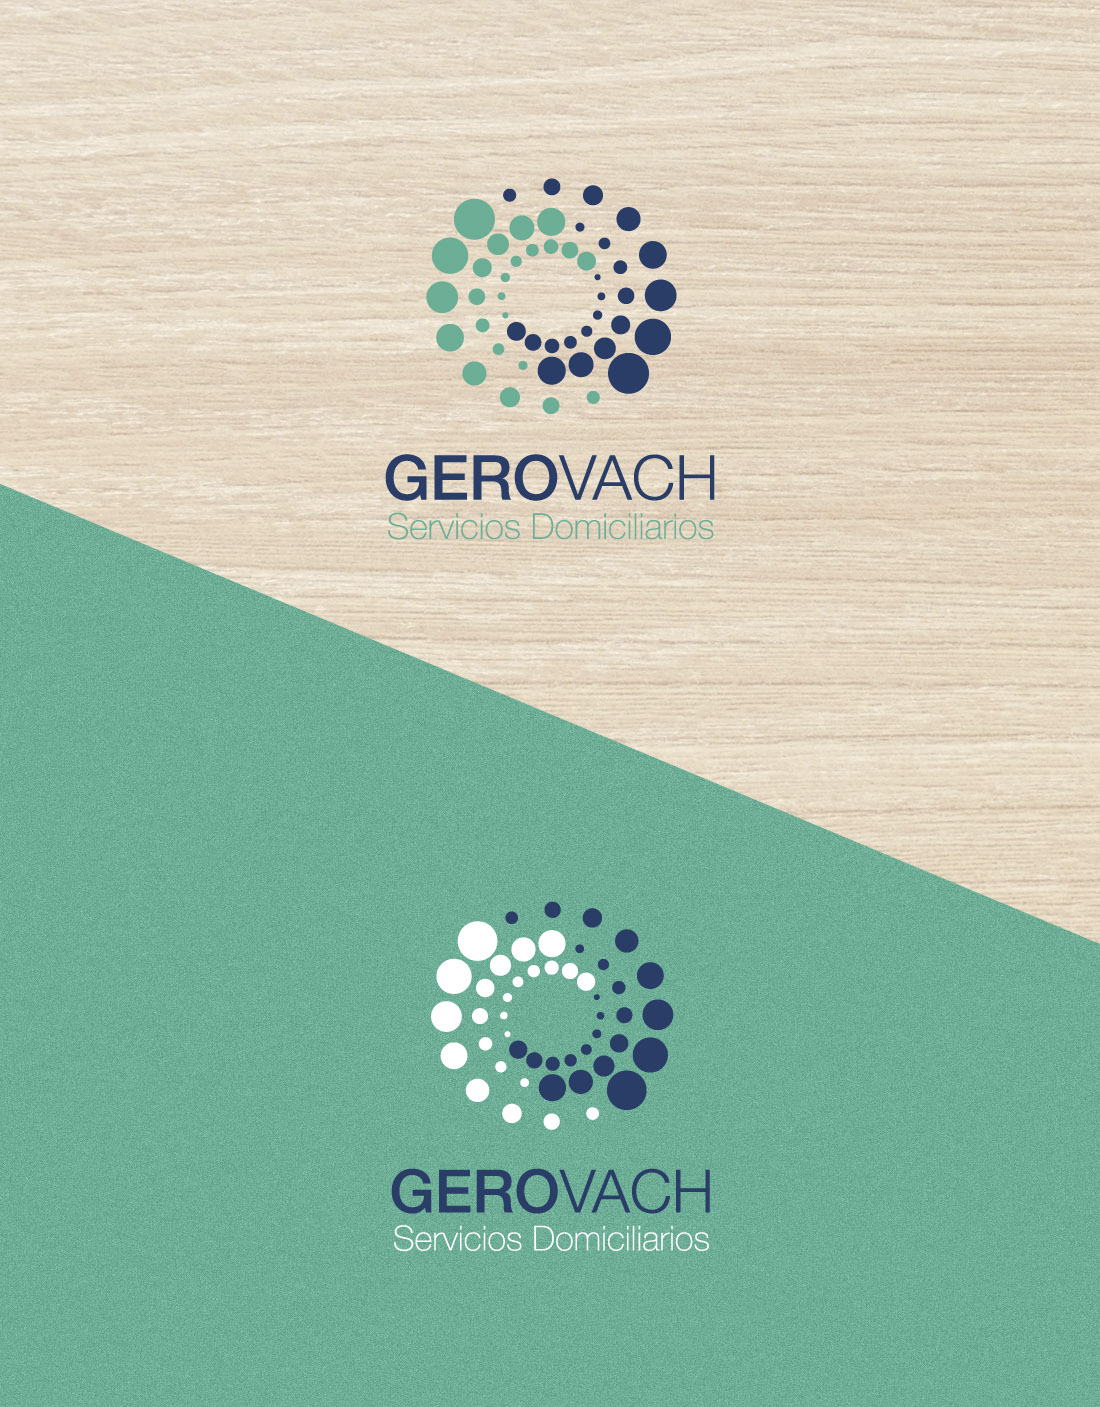 Logo Gerovach